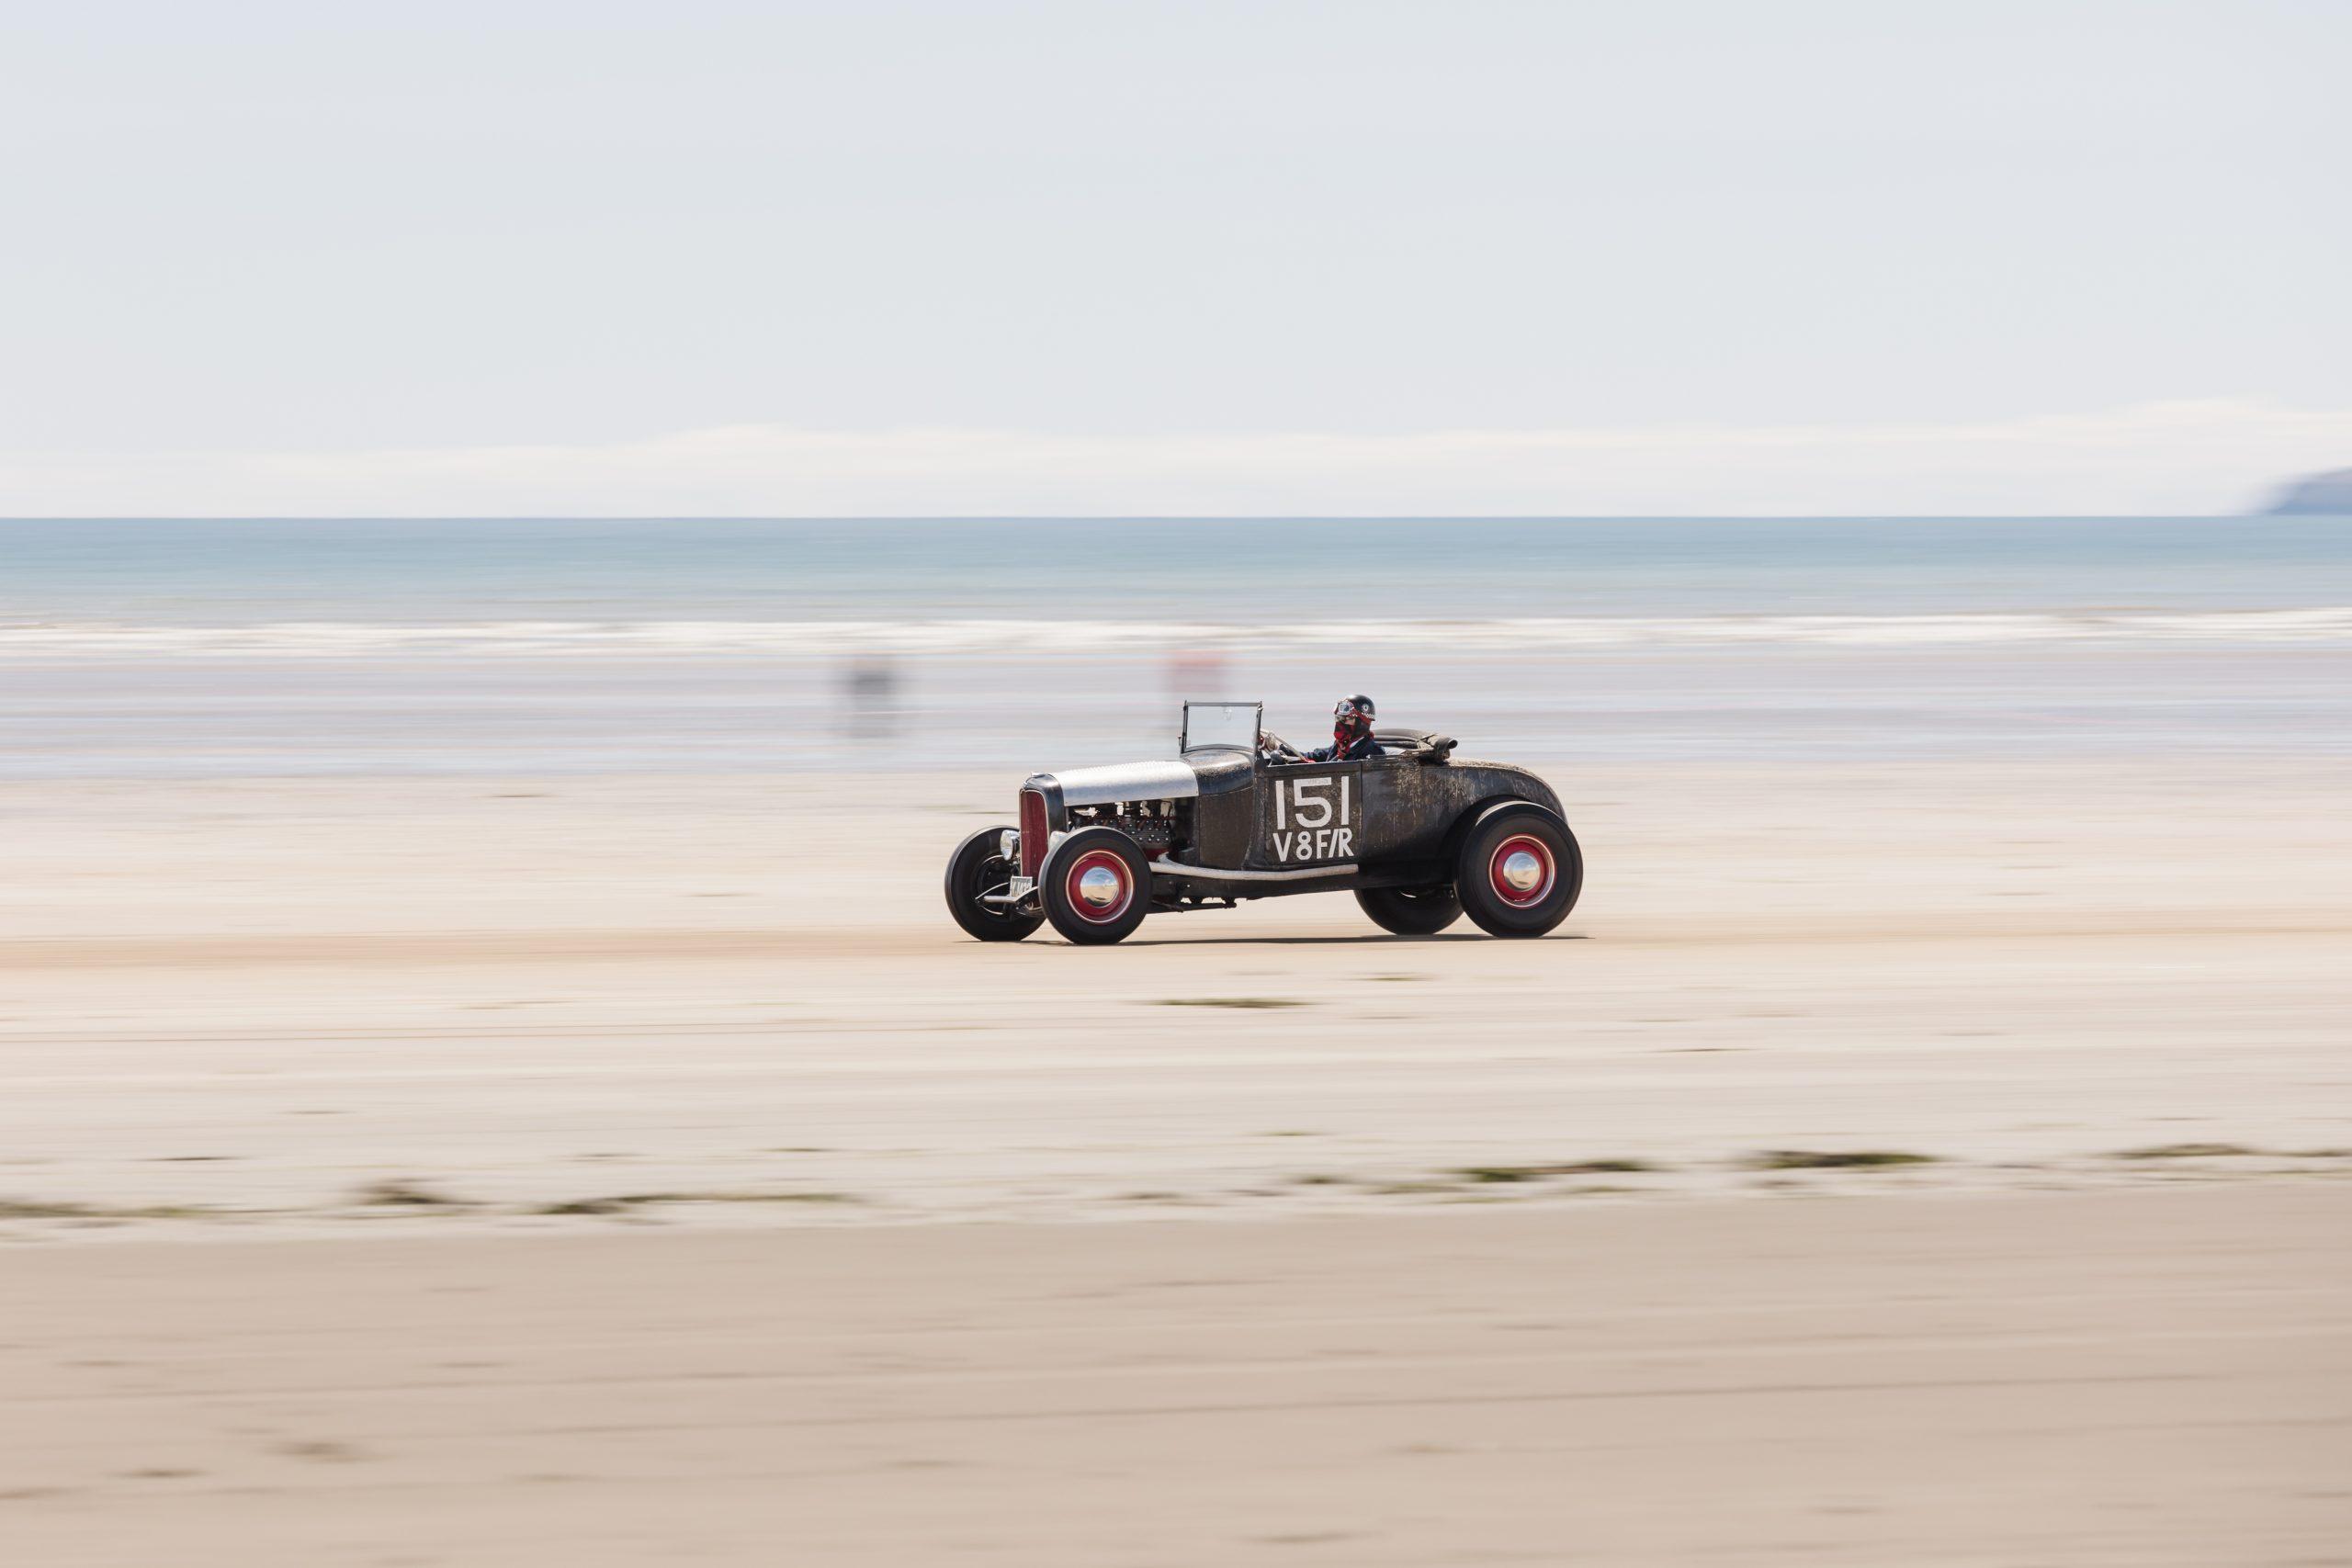 Pendine Sands hot rod racer beach action